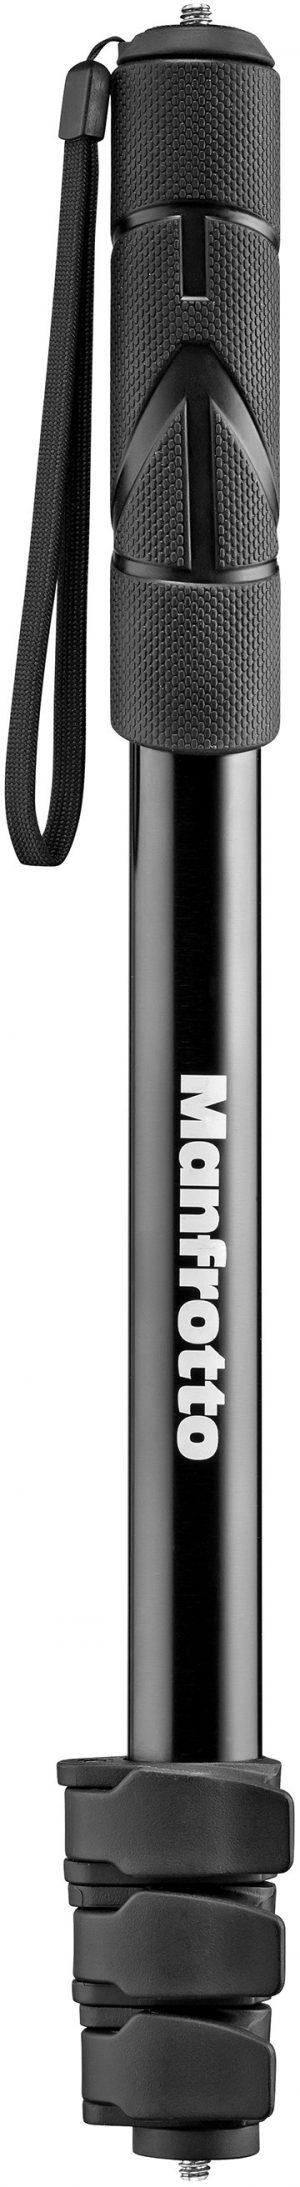 Manfrotto üksjalg-käsistatiiv MPCOMPACT-BK, must